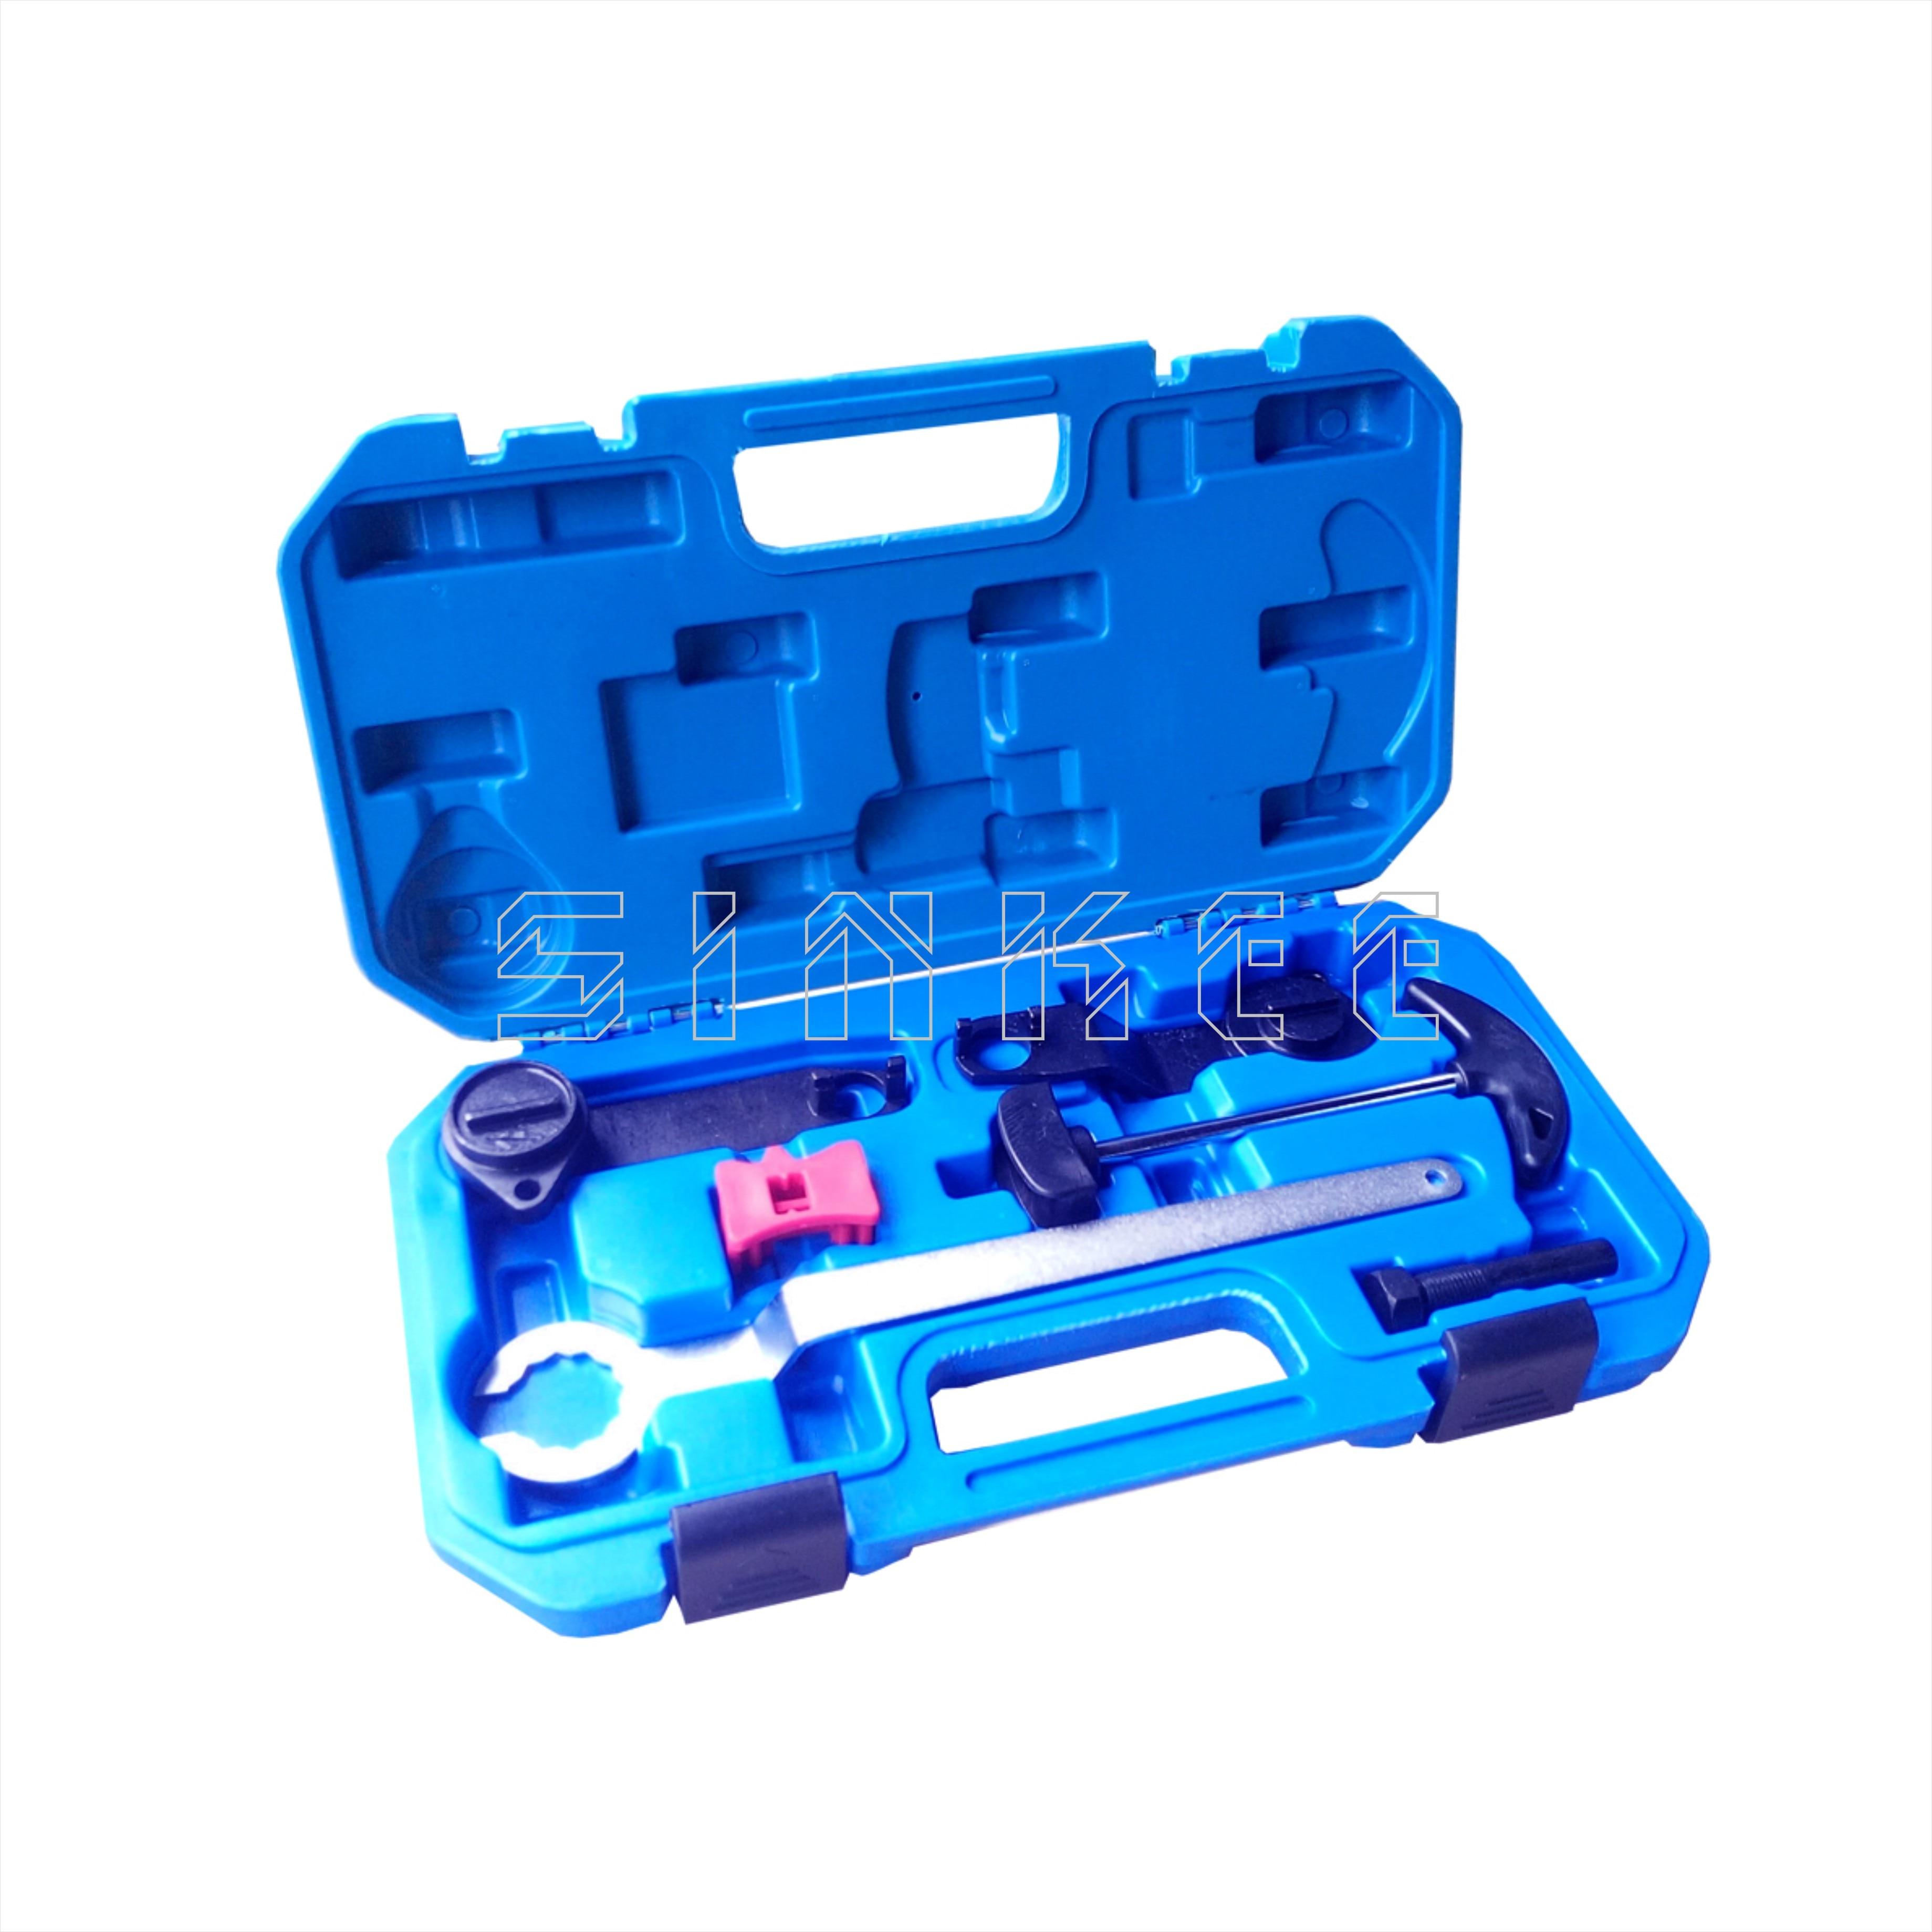 TiALN OSG USA 859523911 2.39mm x 46mm OAL HSSE Drill